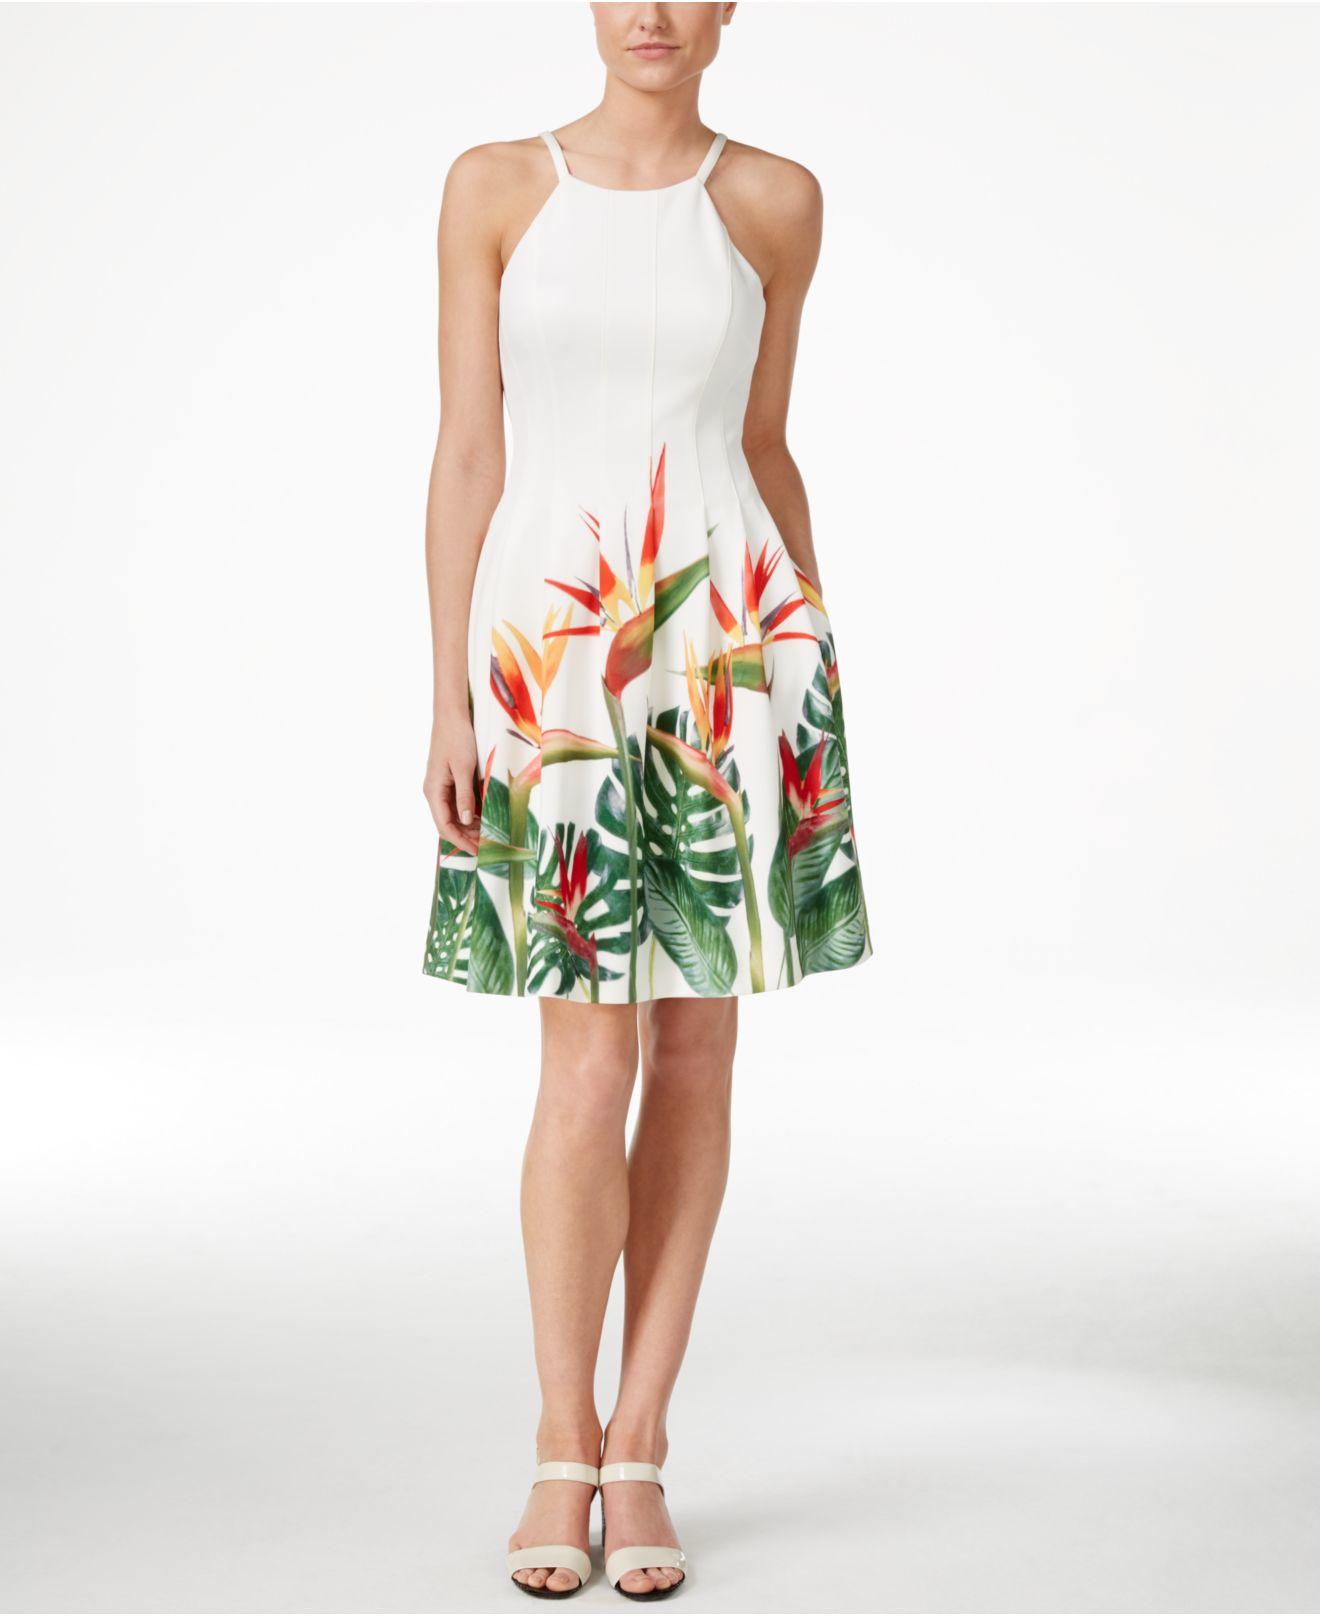 4cbe36227e665 Lyst - Calvin Klein Tropical-print Fit   Flare Halter Dress in White